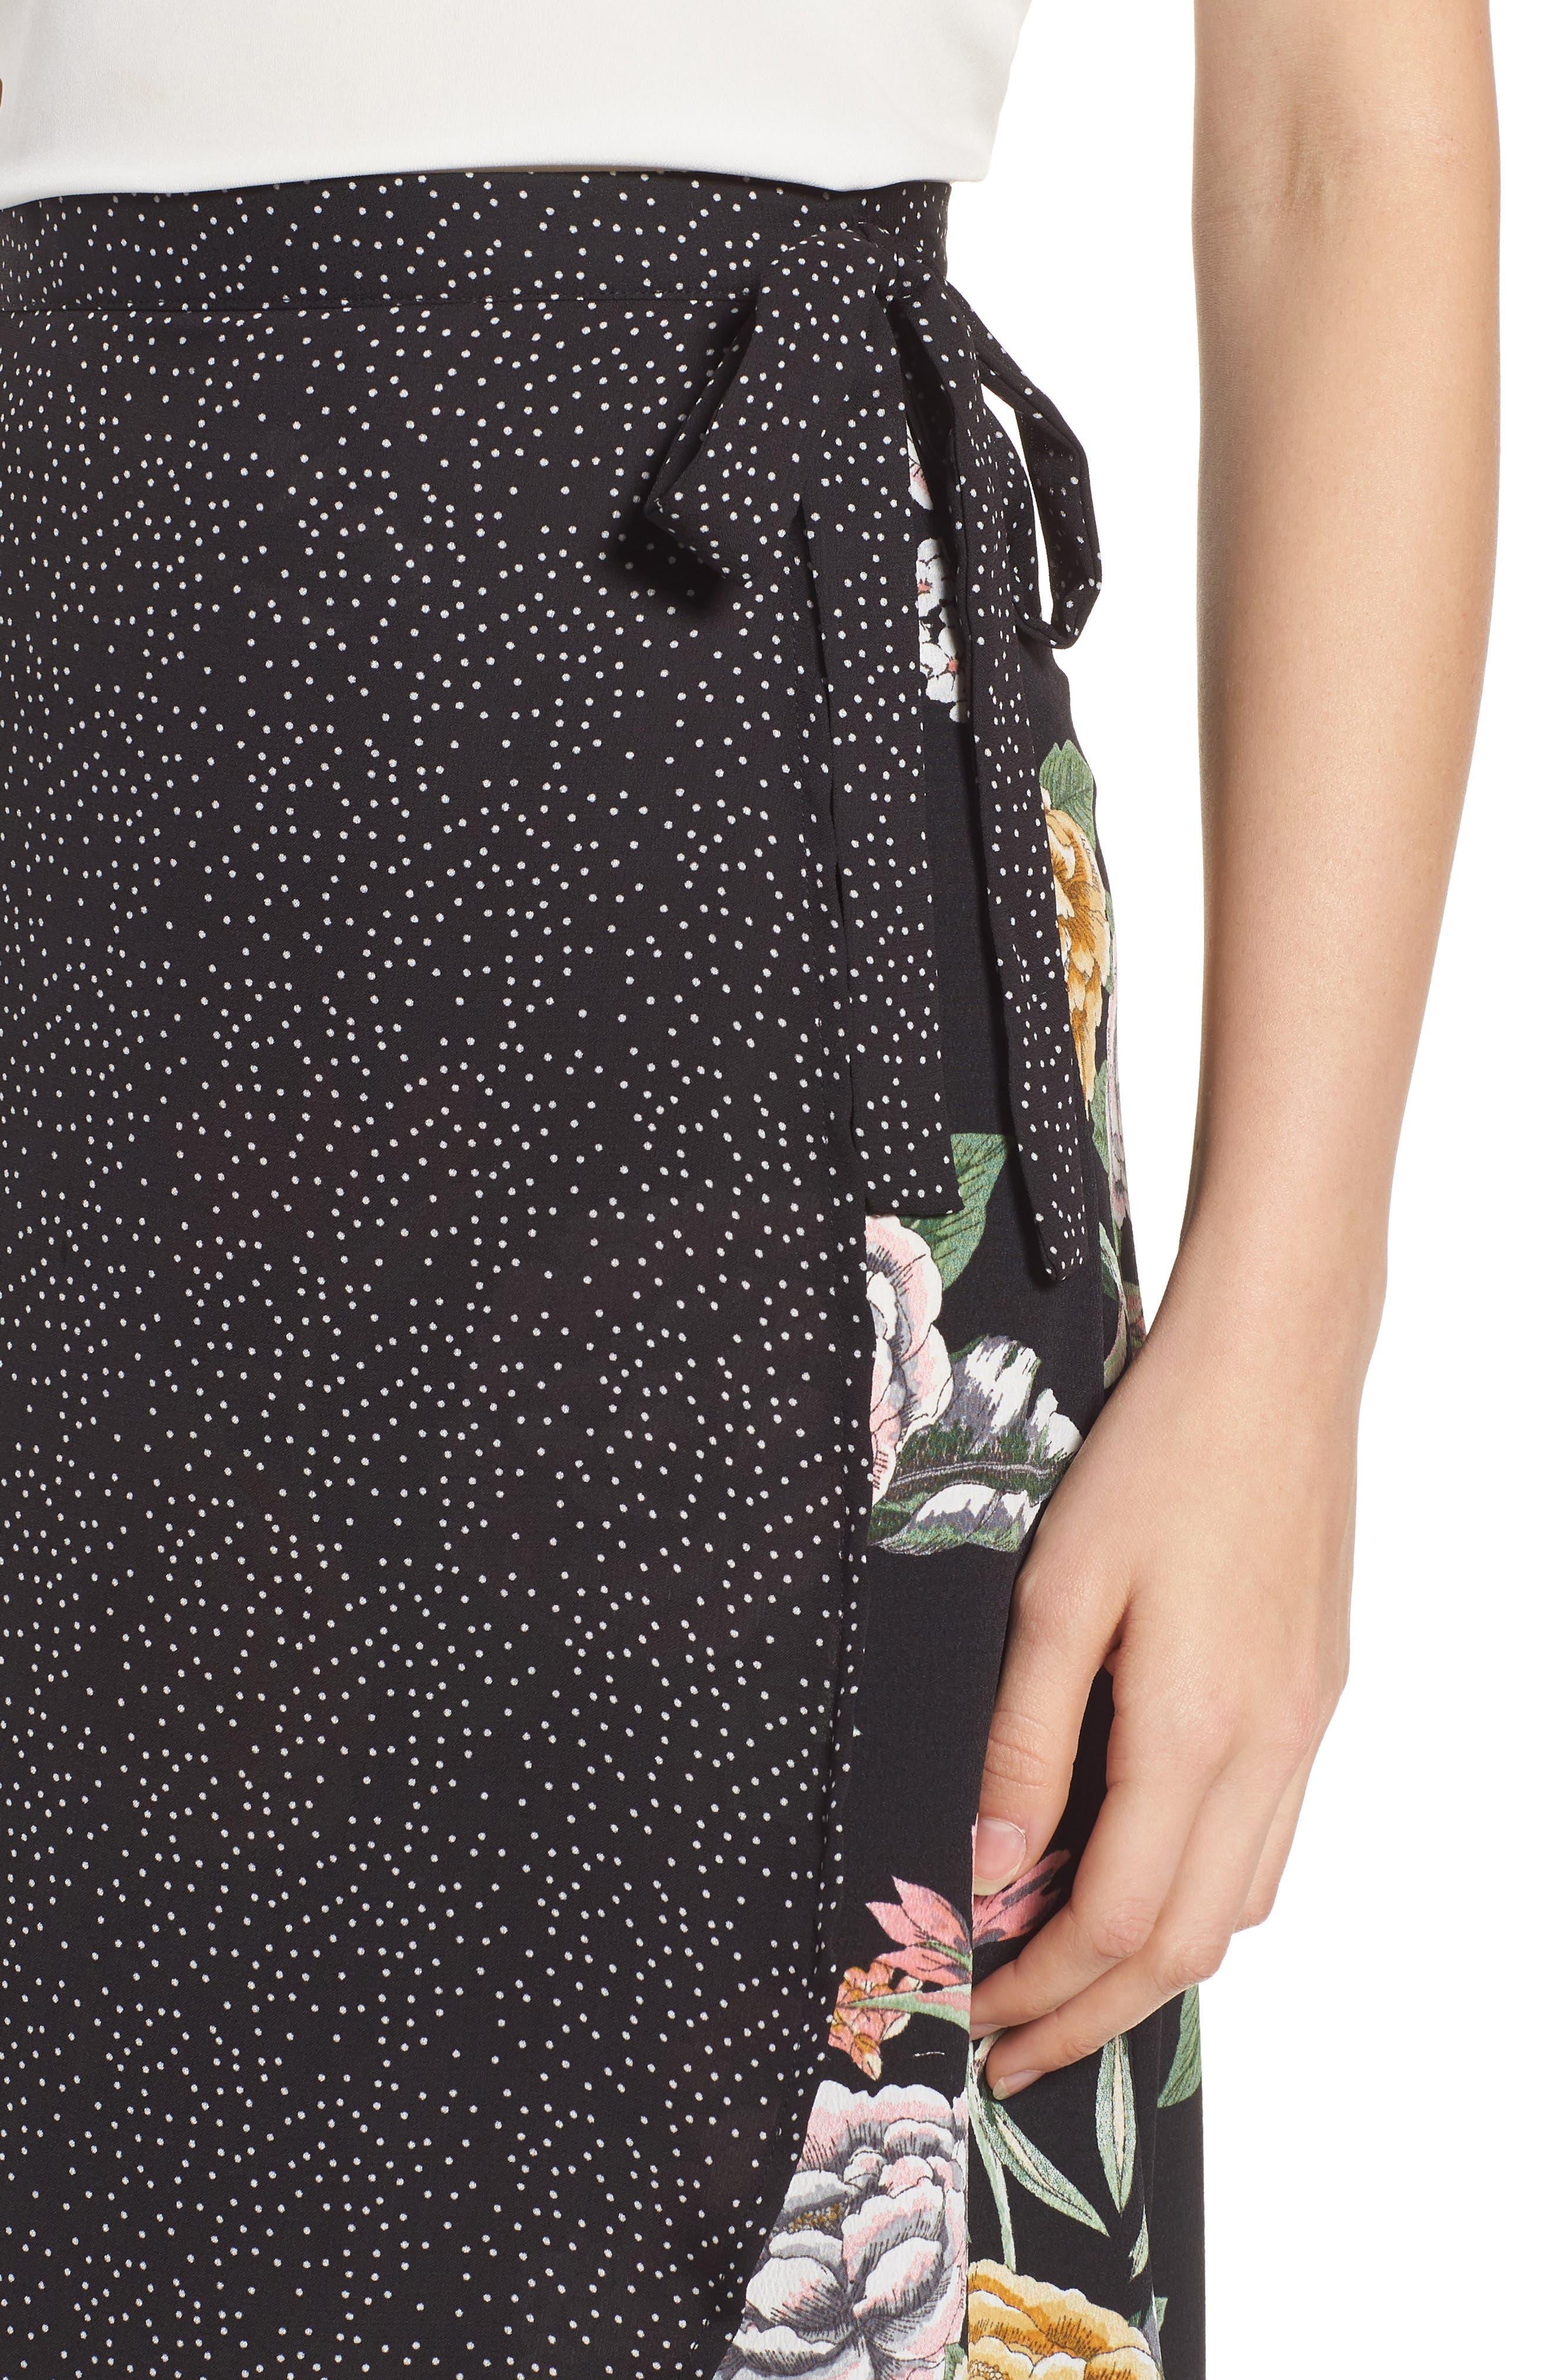 Bishop + Young Enchanted Garden Mix Media Skirt,                             Alternate thumbnail 4, color,                             ENCHANTED GARDEN PRINT